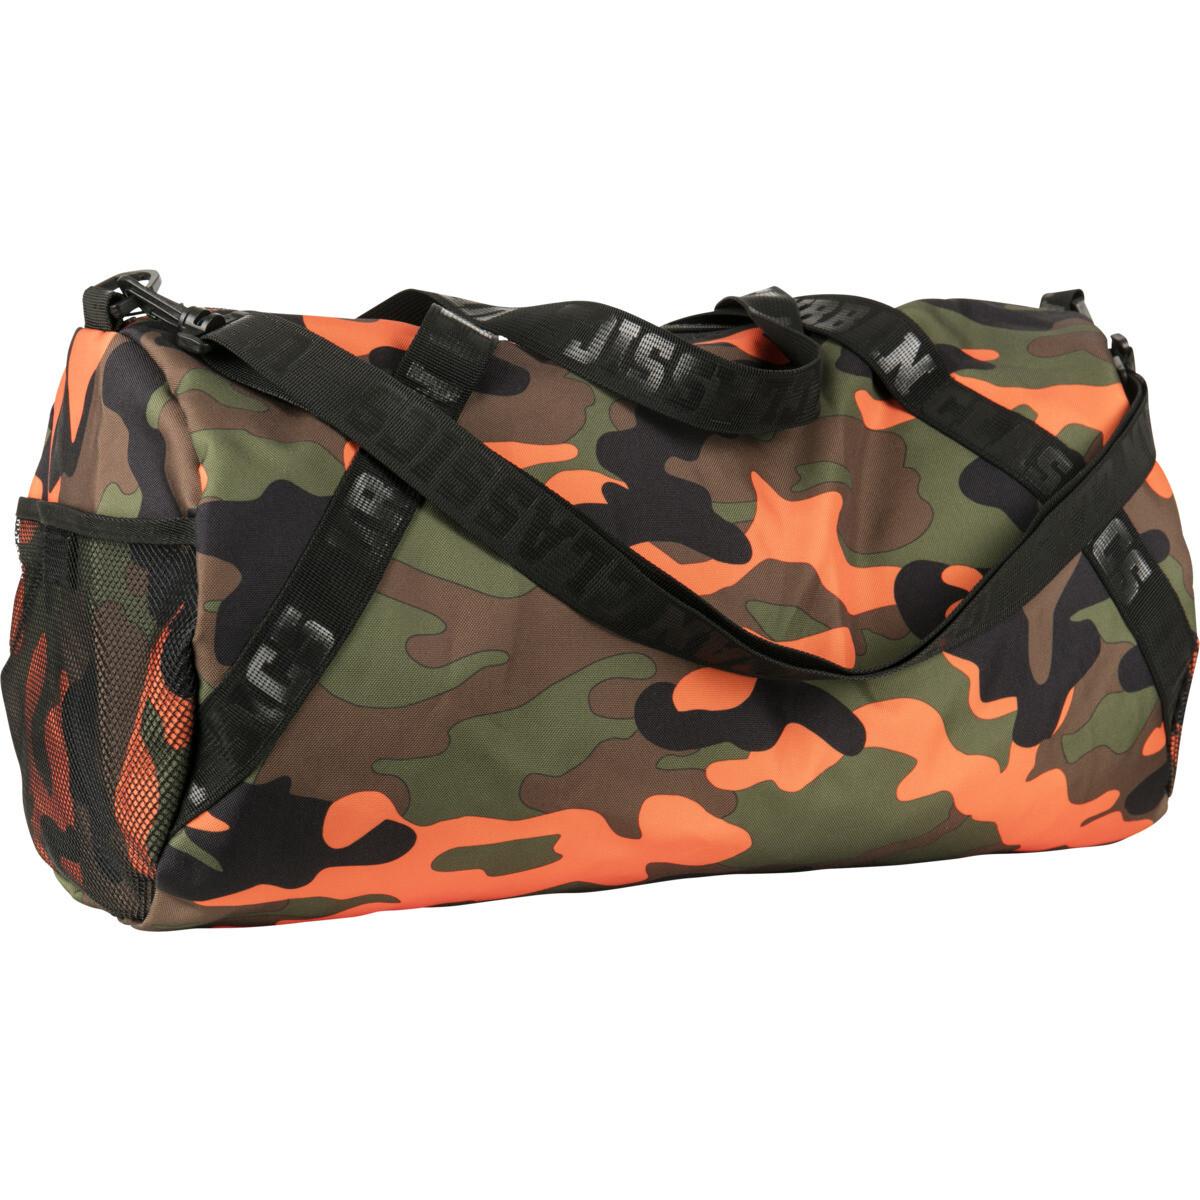 Sports Bag - Orange Camo